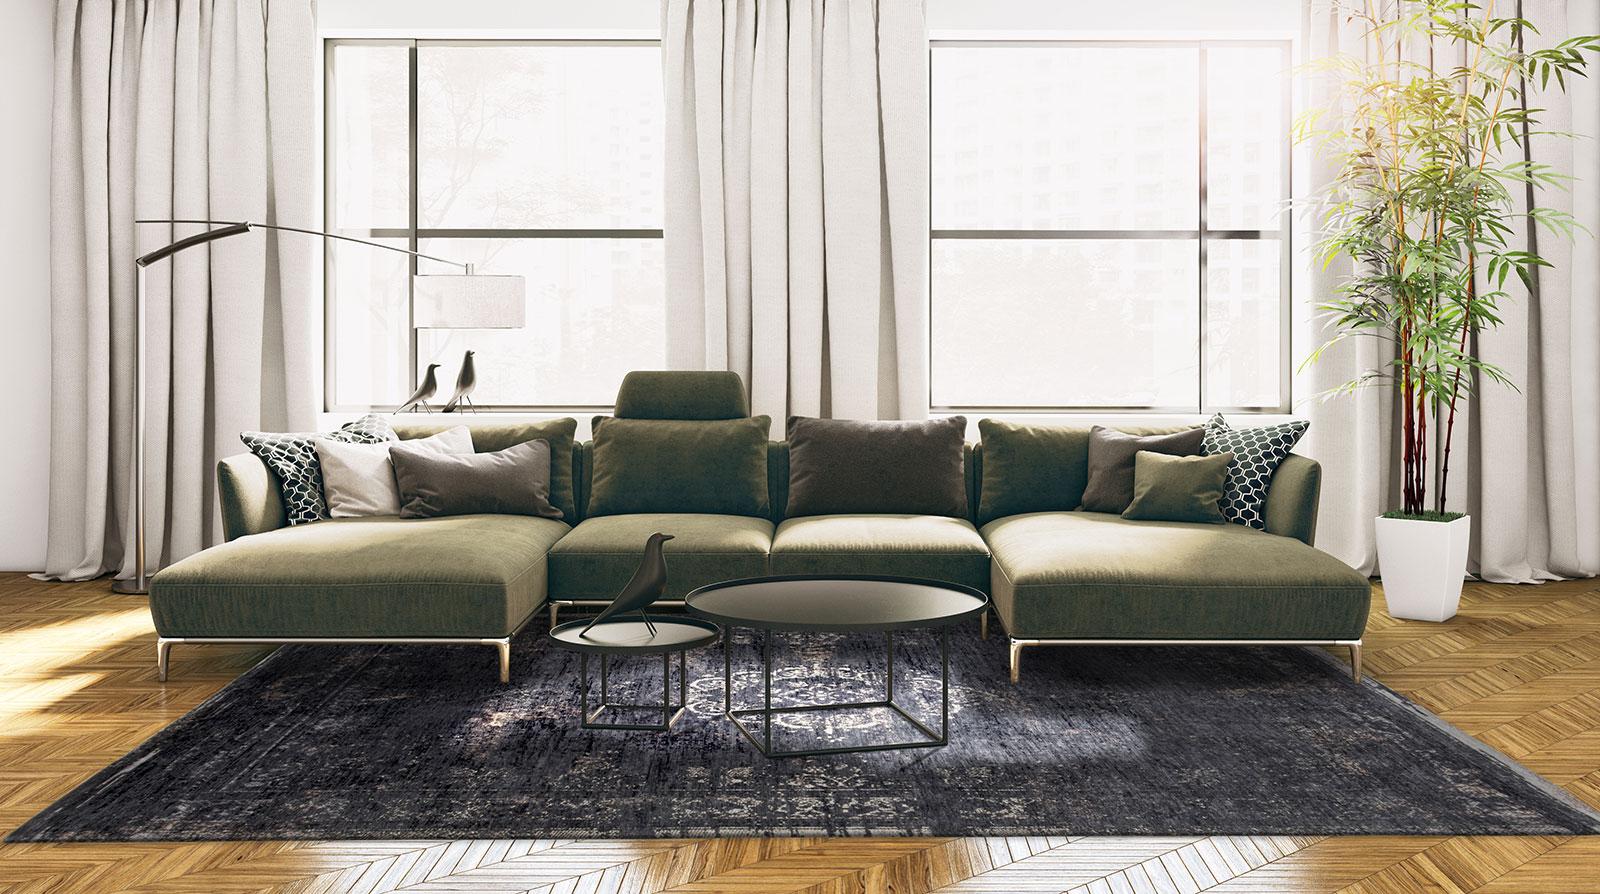 teppich Louis De Poortere LX 8263 Fading World Medaillon Mineral Black interior